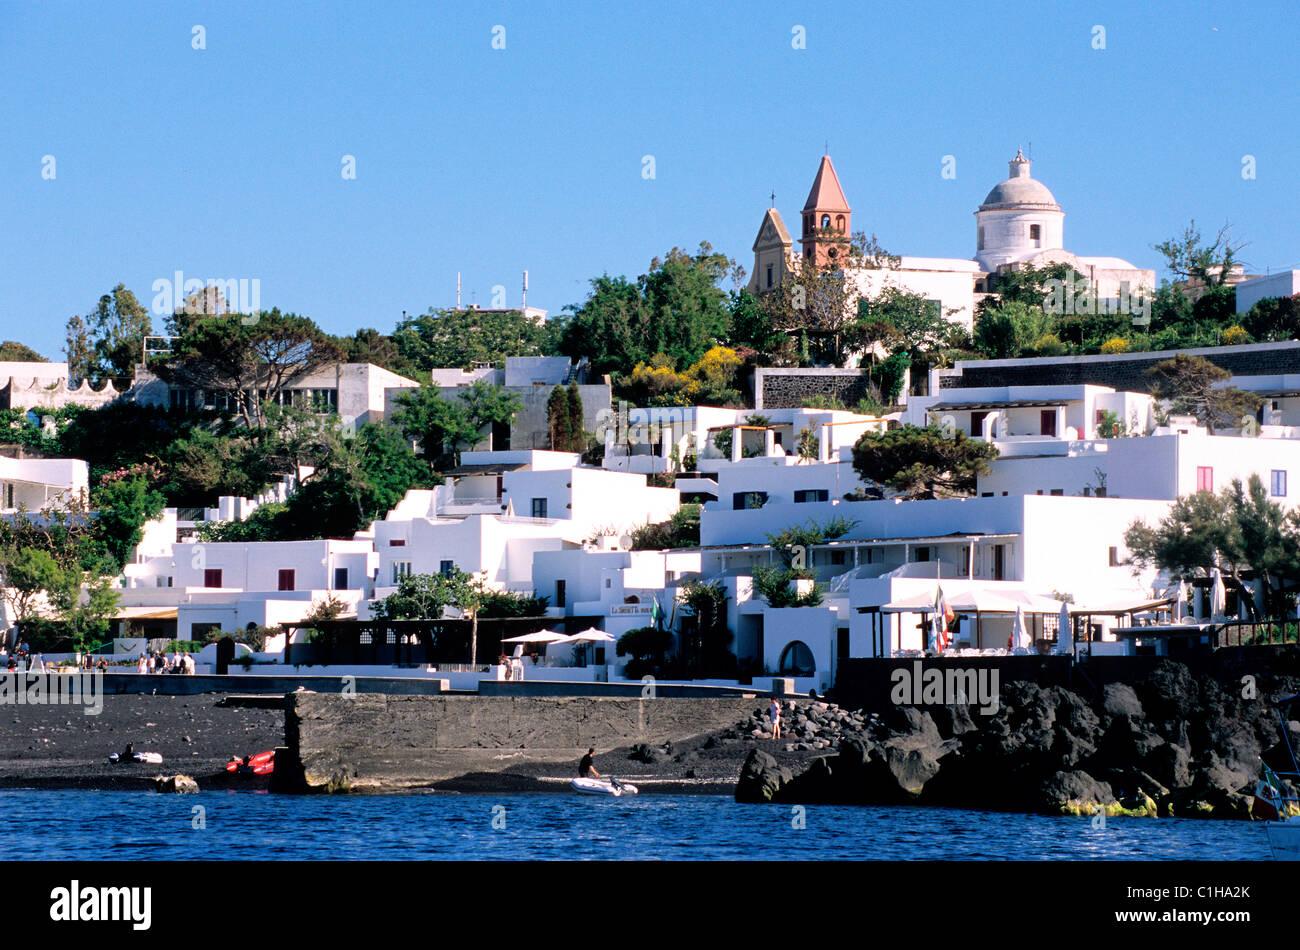 Italy sicily aeolian islands island of panarea san pietro italy sicily aeolian islands island of panarea san pietro village sciox Gallery